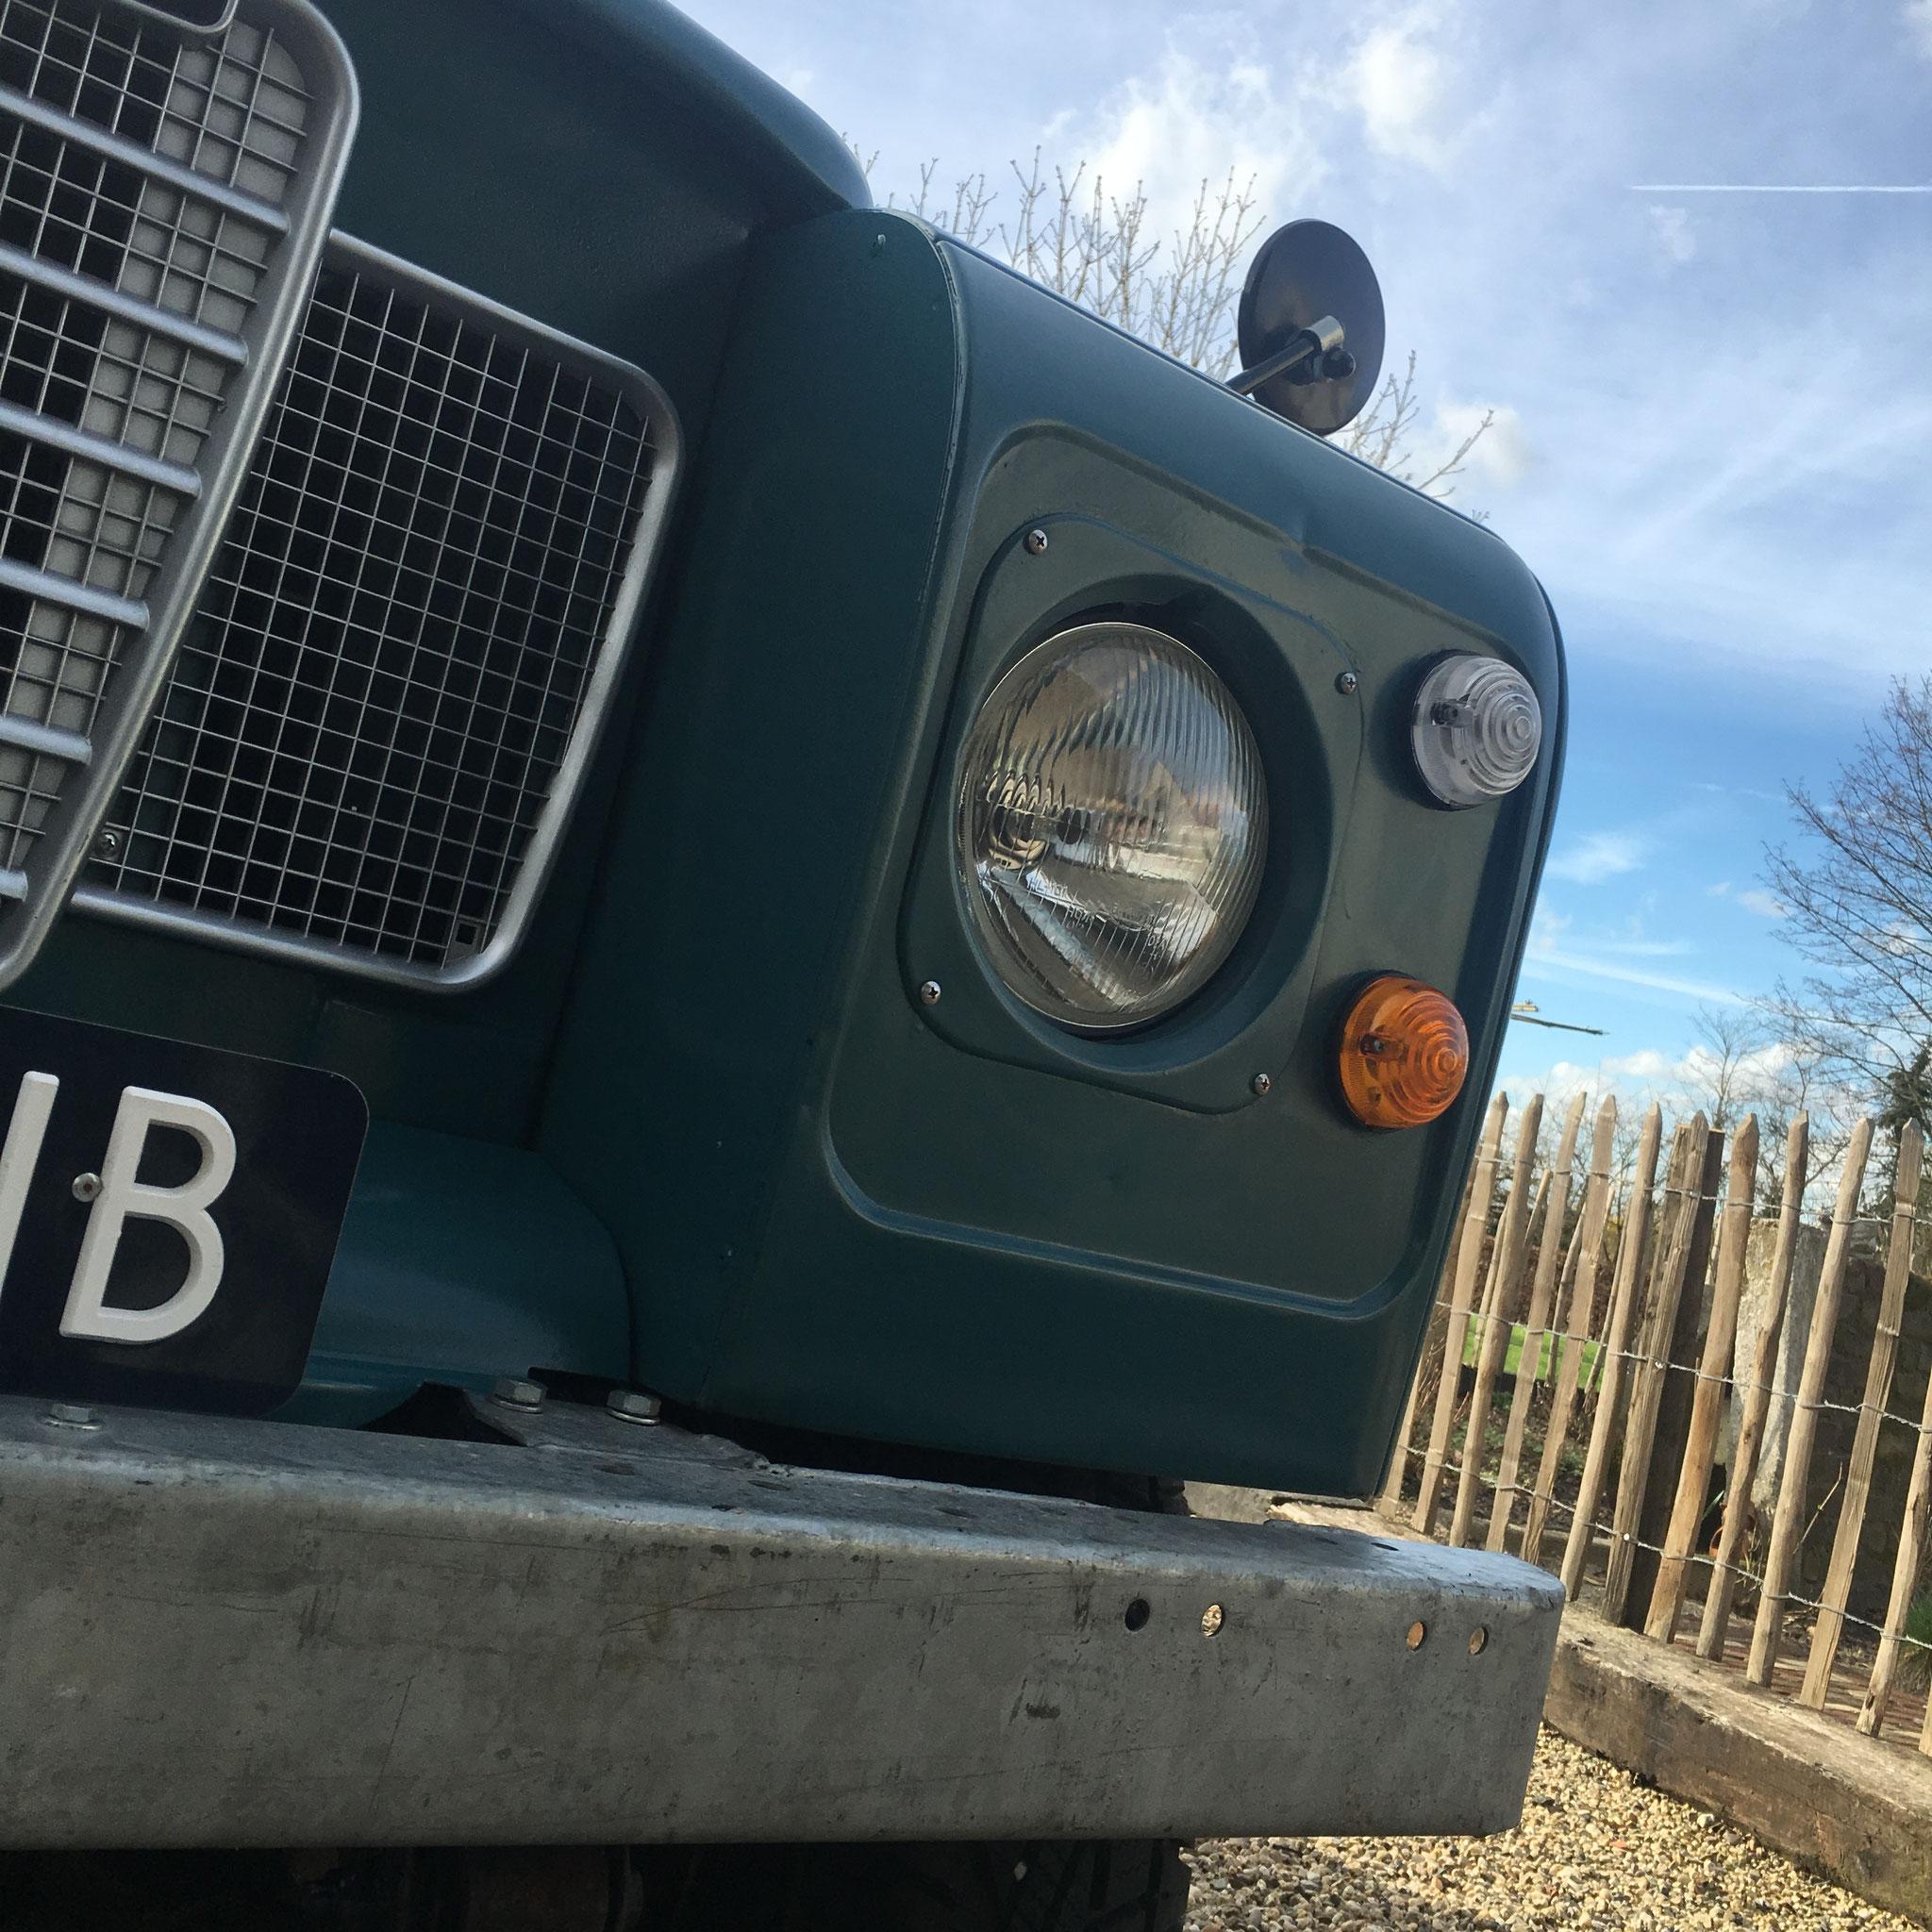 1976 Land Rover Serie III 2.25 Benzine